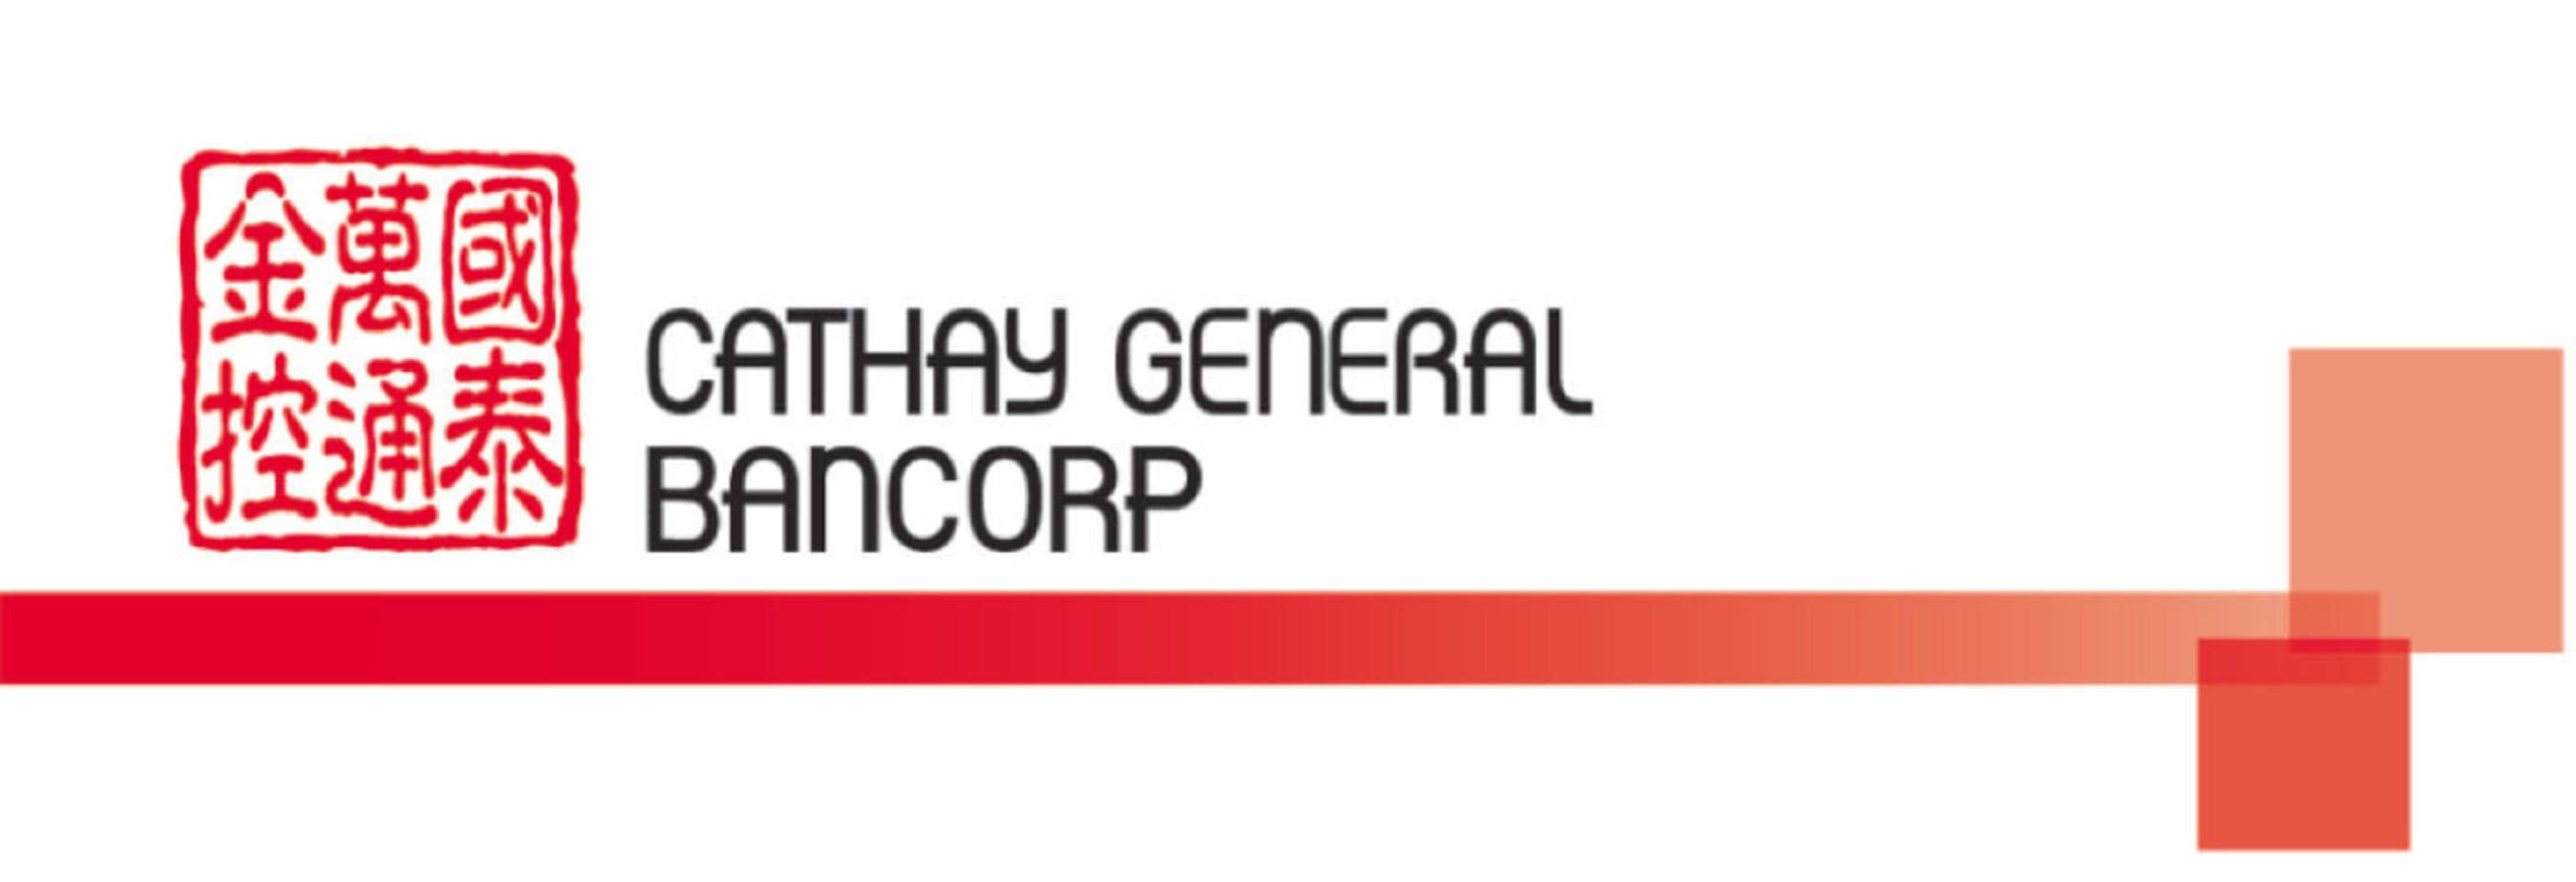 Cathay General Bancorp (PRNewsFoto/Cathay General Bancorp)